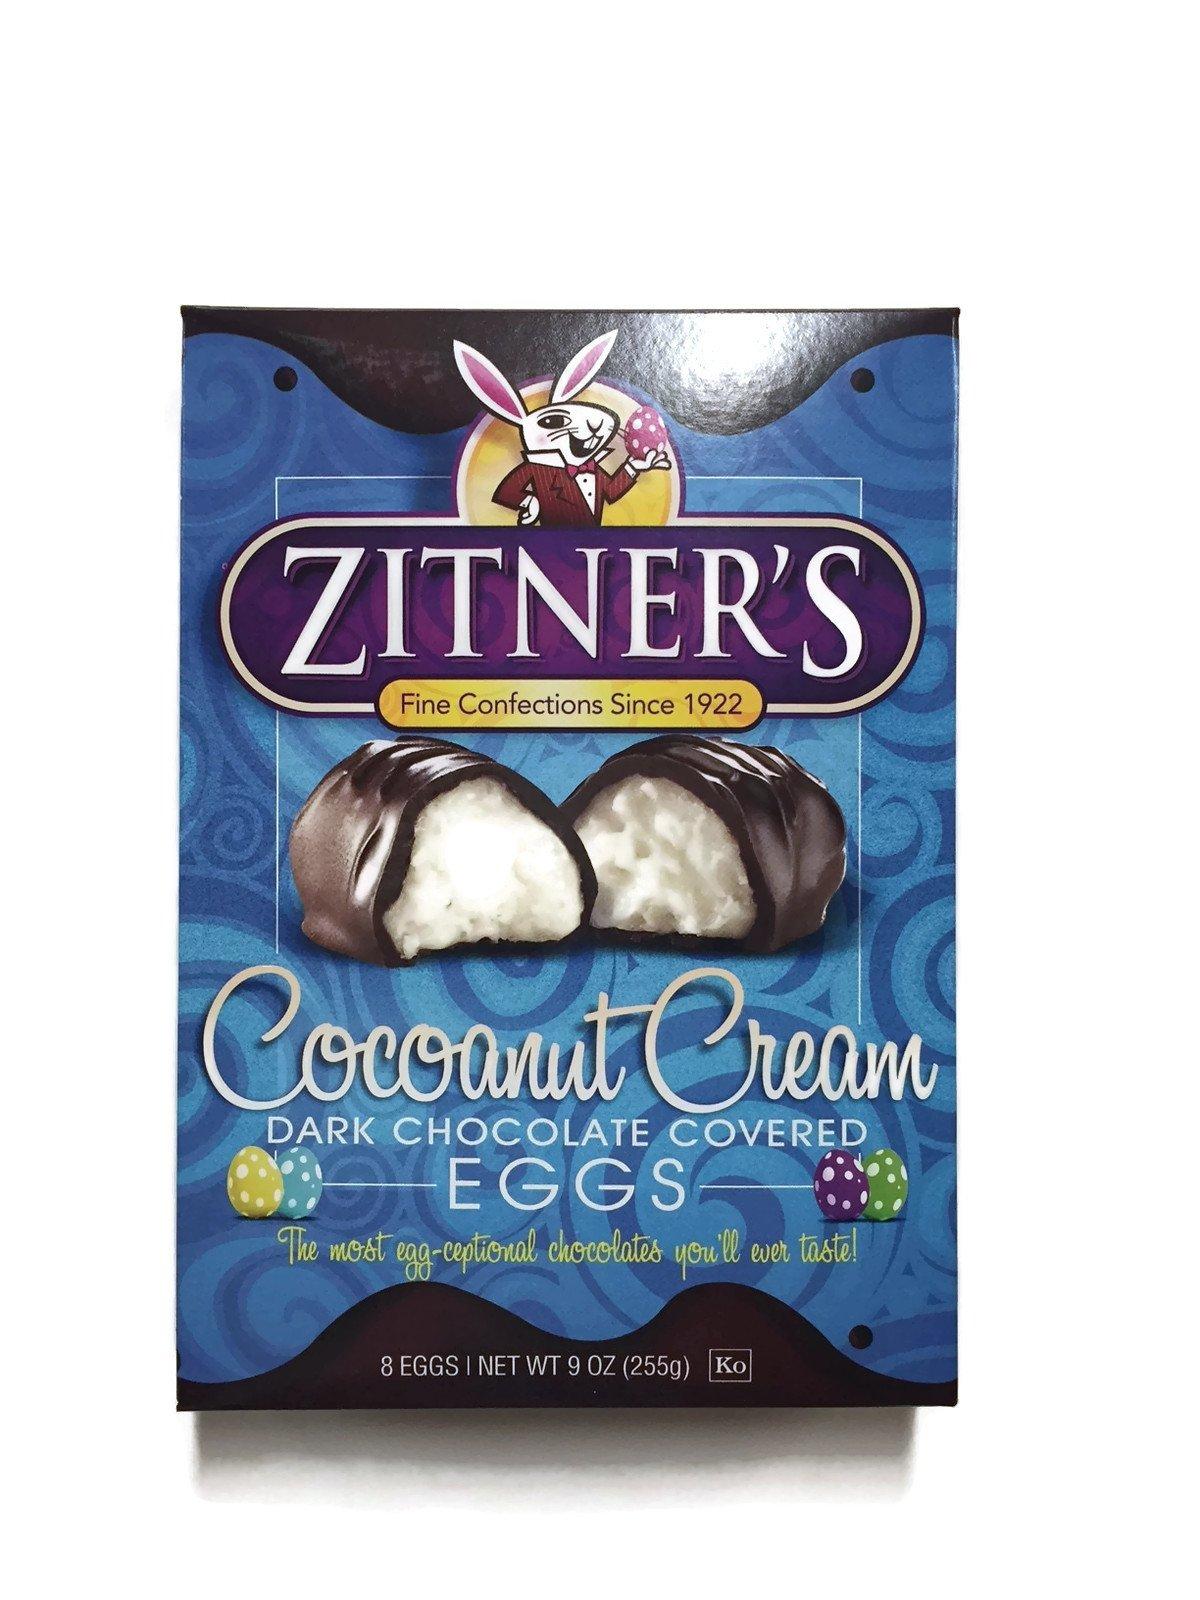 Zitners Coconut Cream Chocolate Covered Eggs